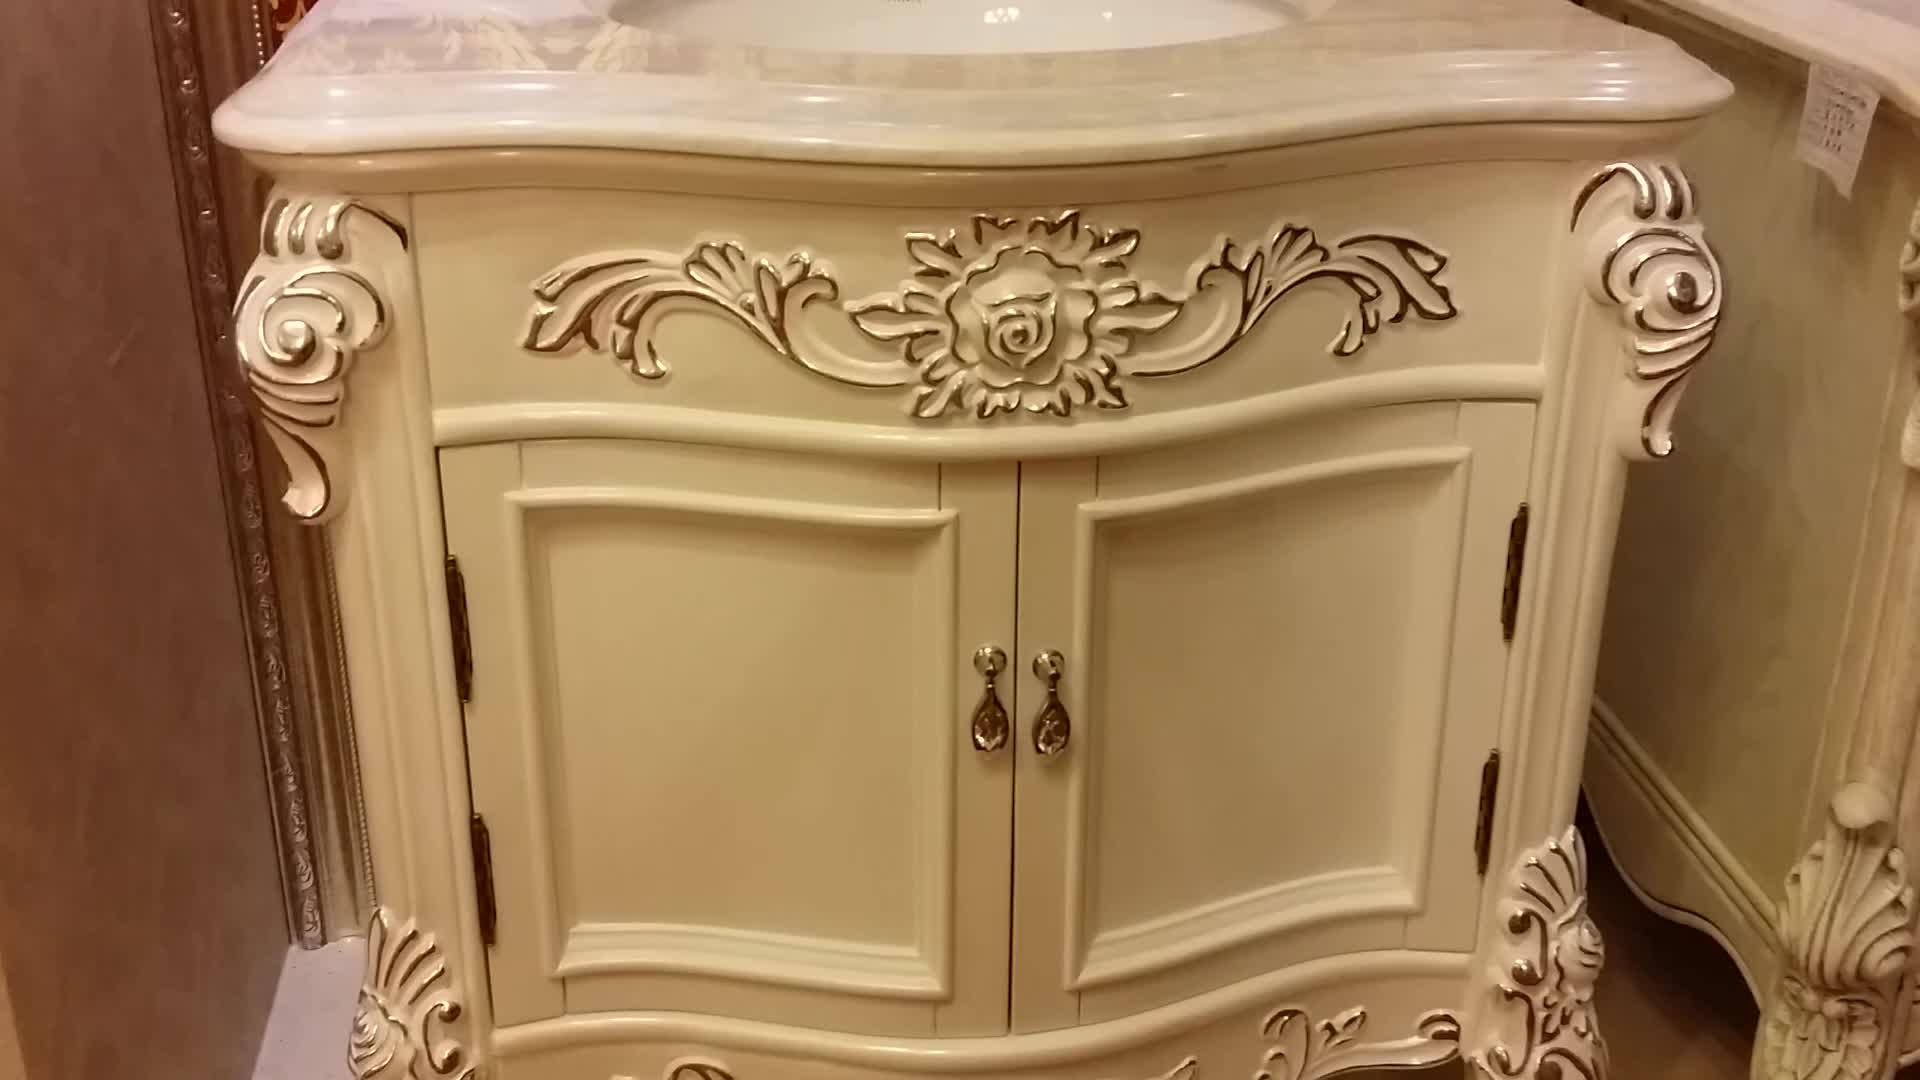 30 Inch Oak Bathroom Vanity In Pearl White With Silver Leaf Single Sink Wts1604 Buy Bathroom